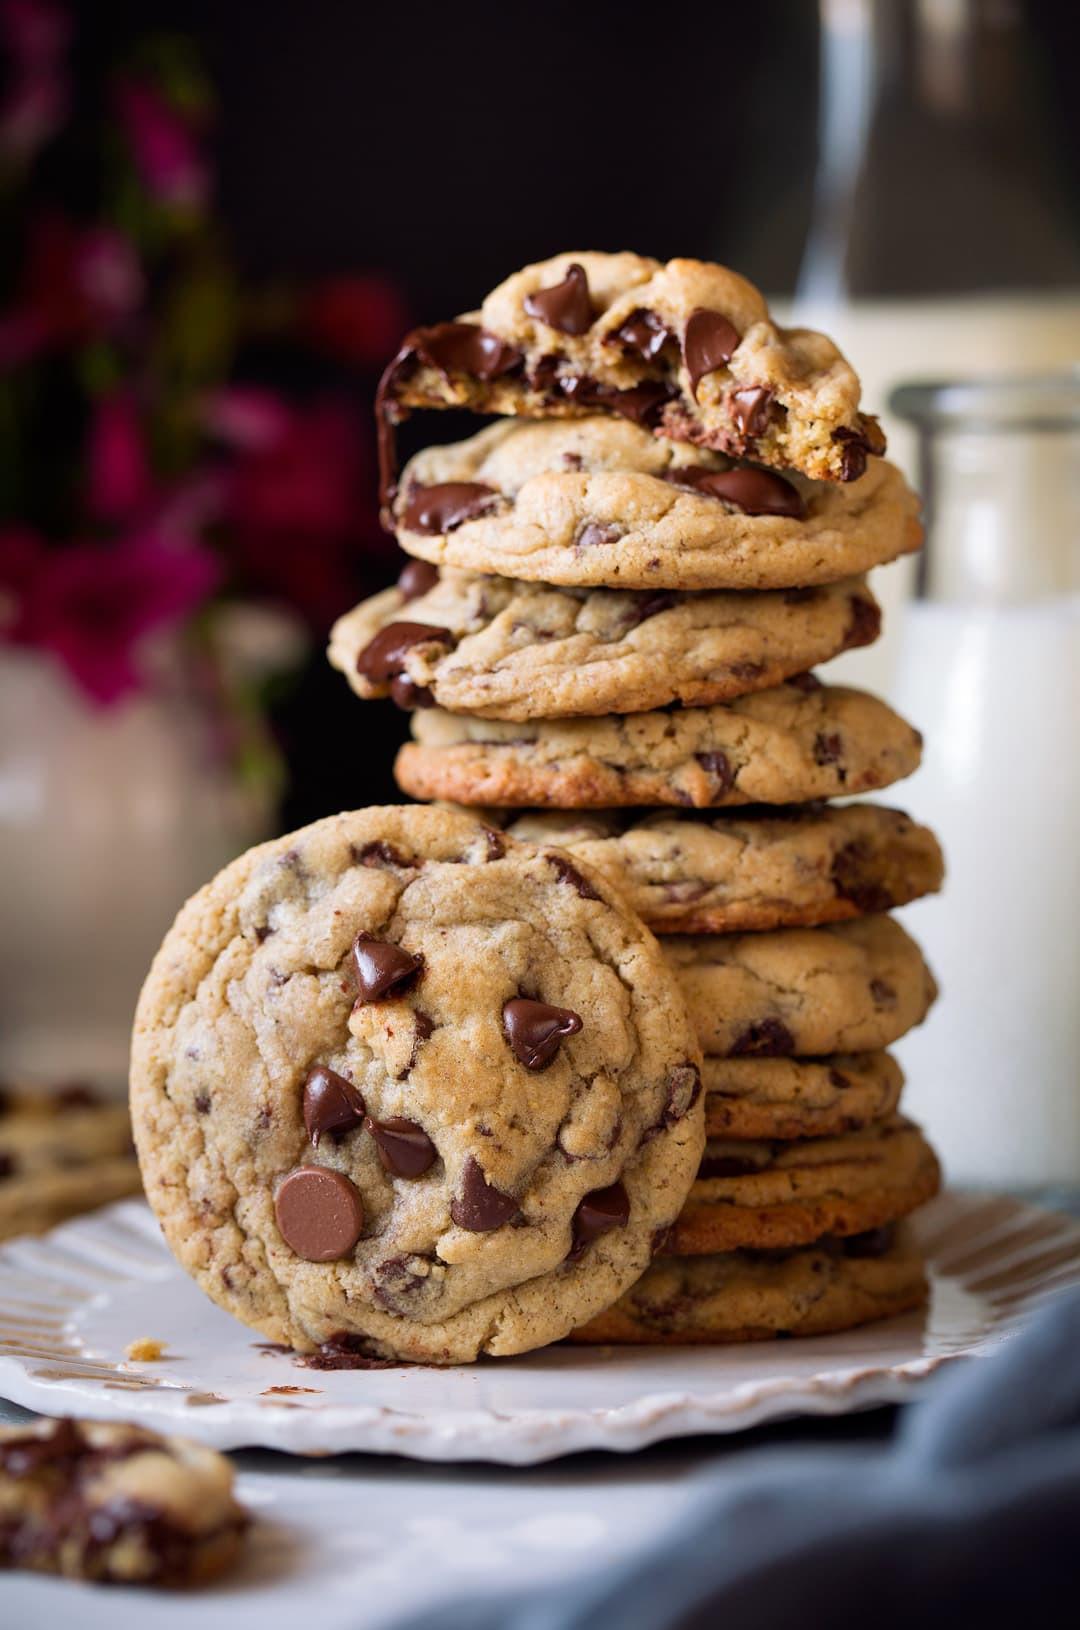 Neiman Marcus Cookies Recipe  Chocolate Chip Cookies Neiman Marcus Recipe Cooking Classy